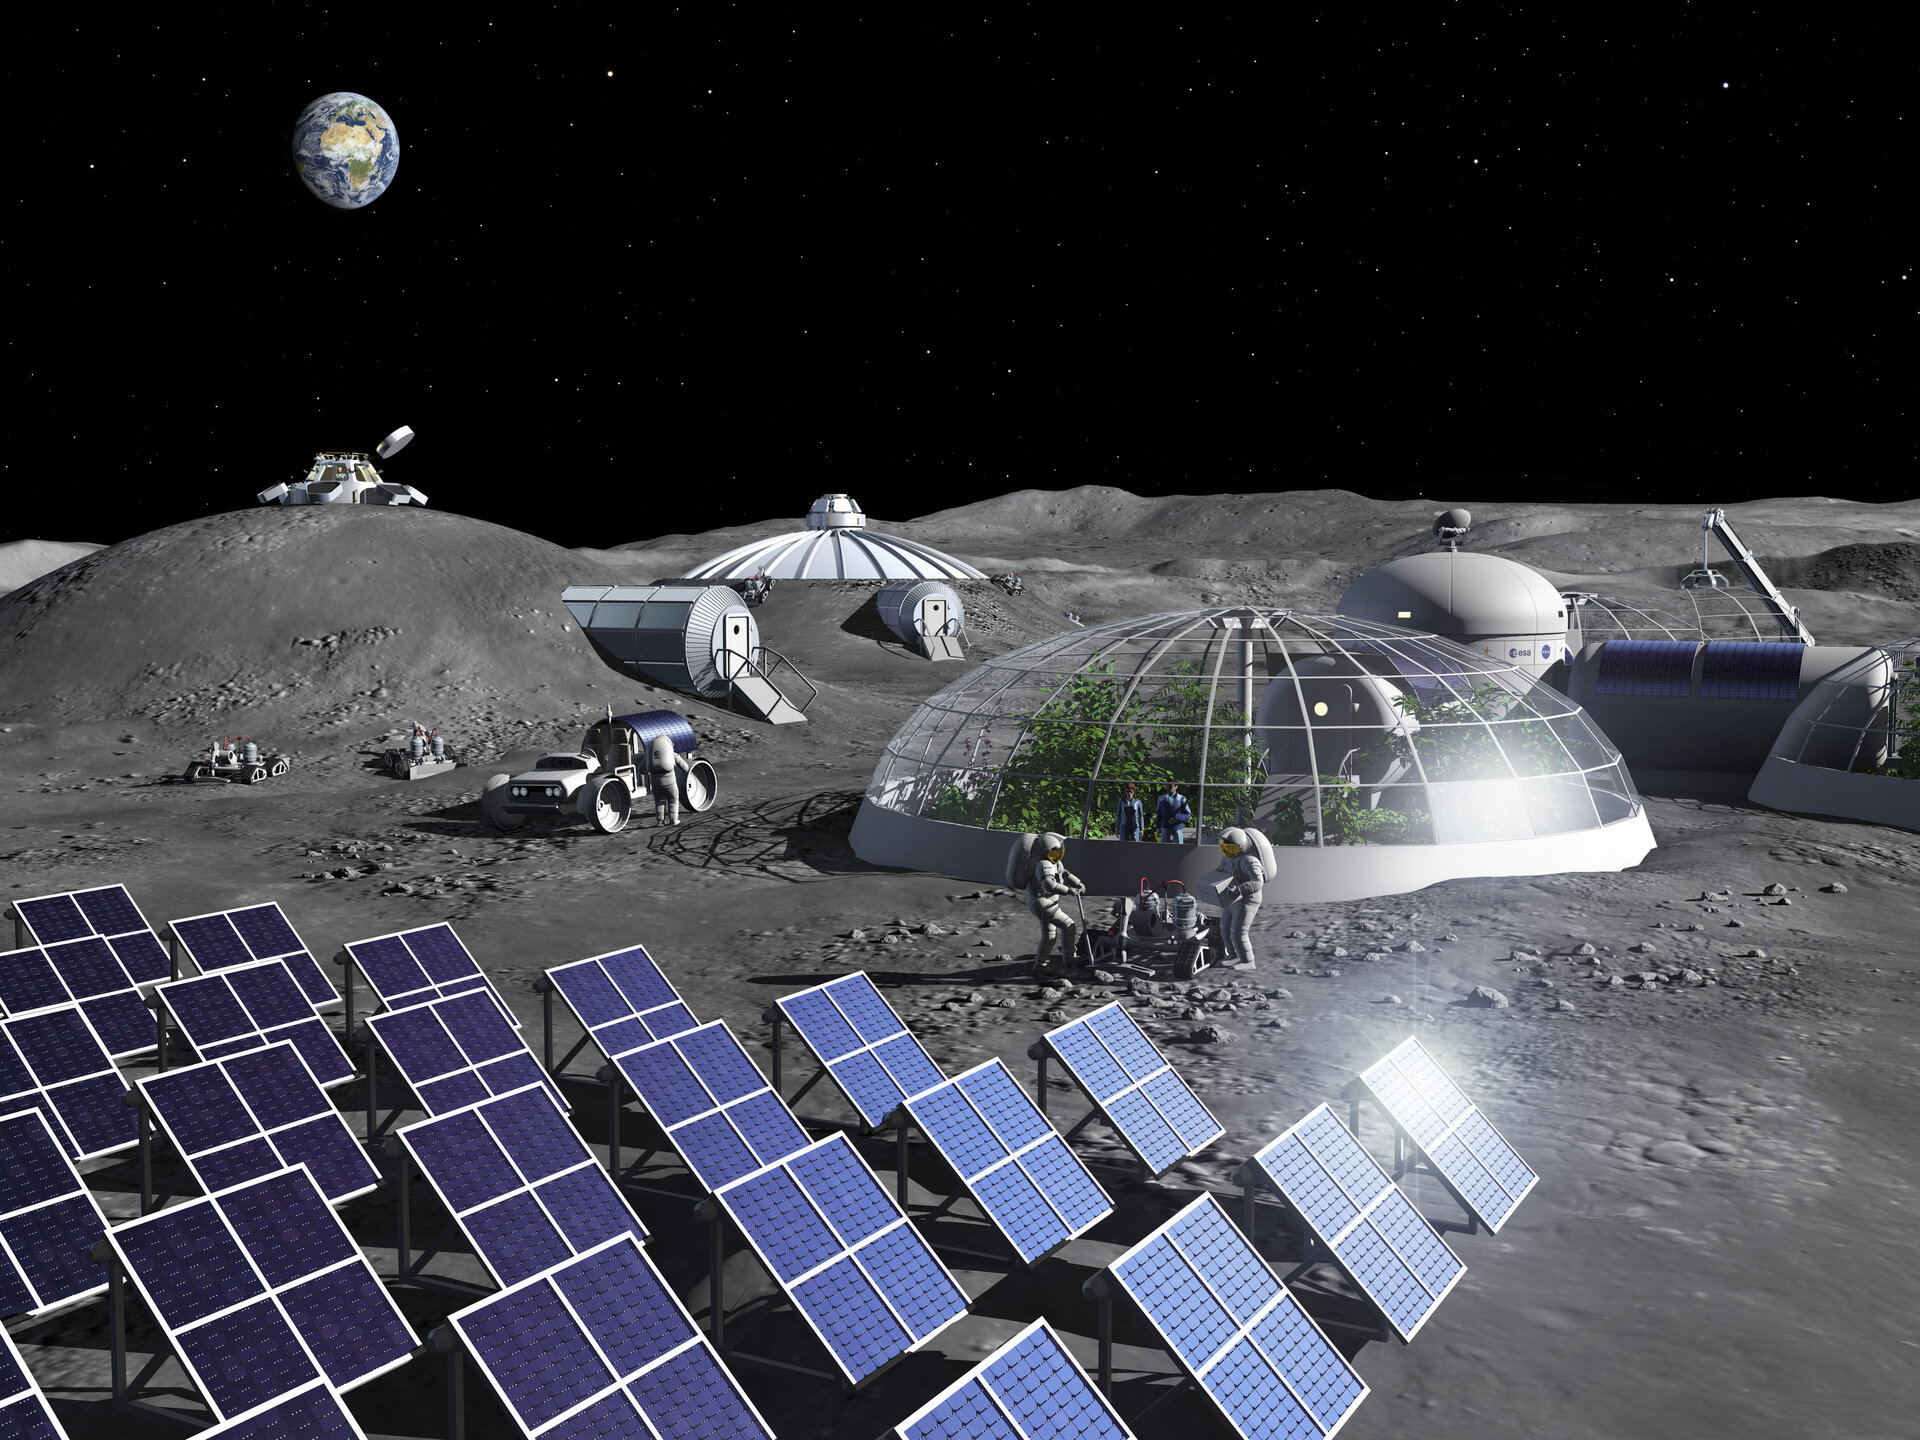 Měsíc, kolonie